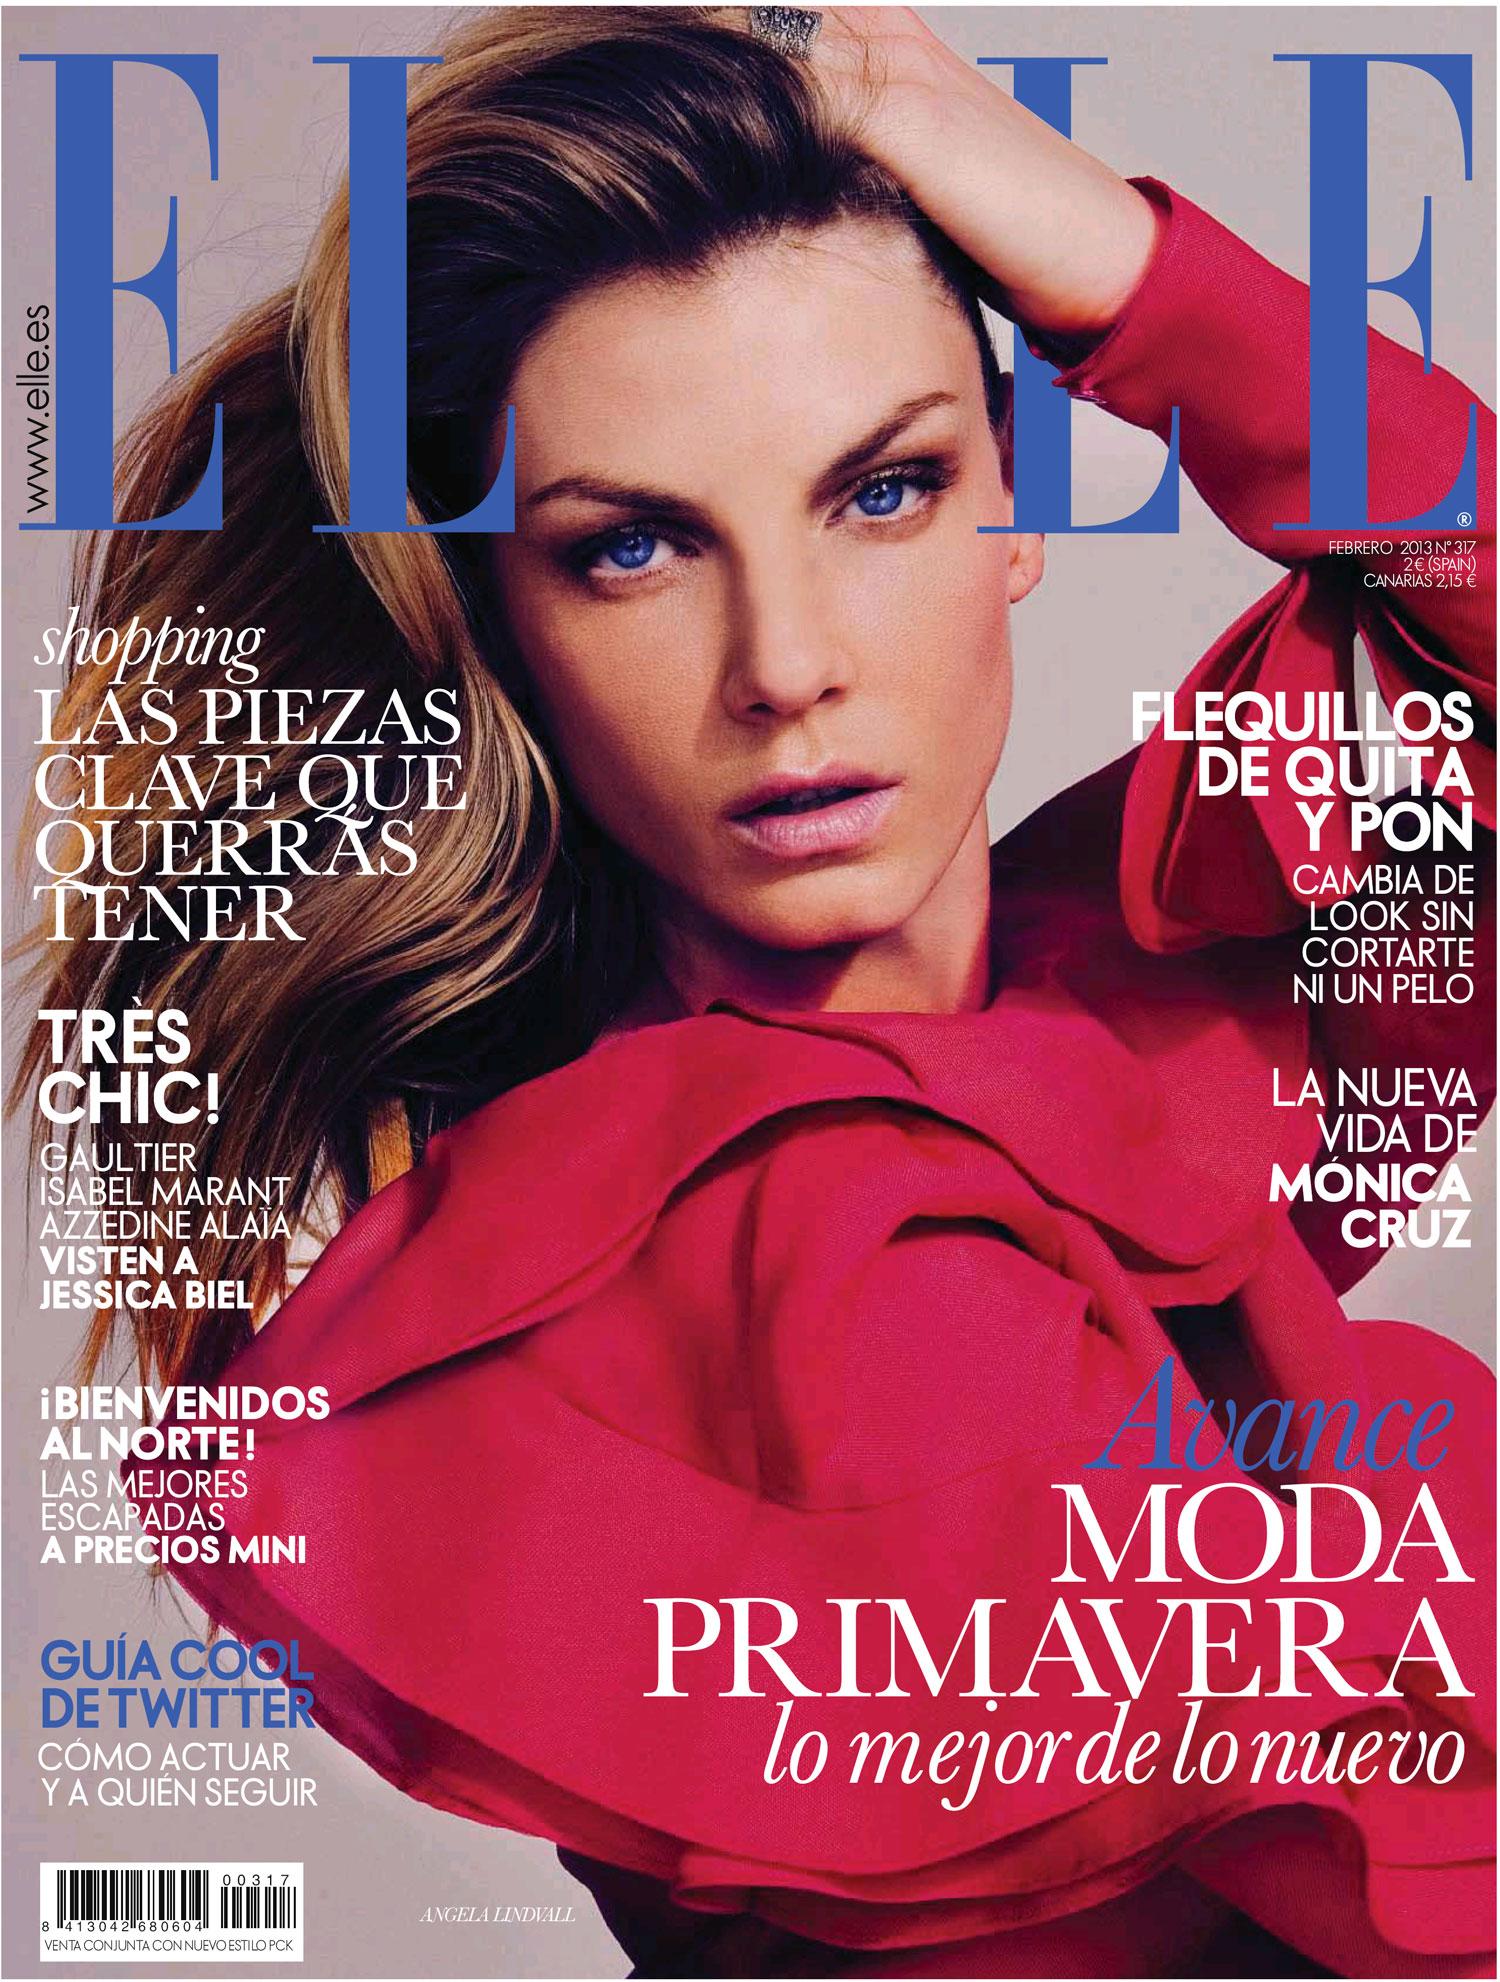 ELLE portada febrero 2013